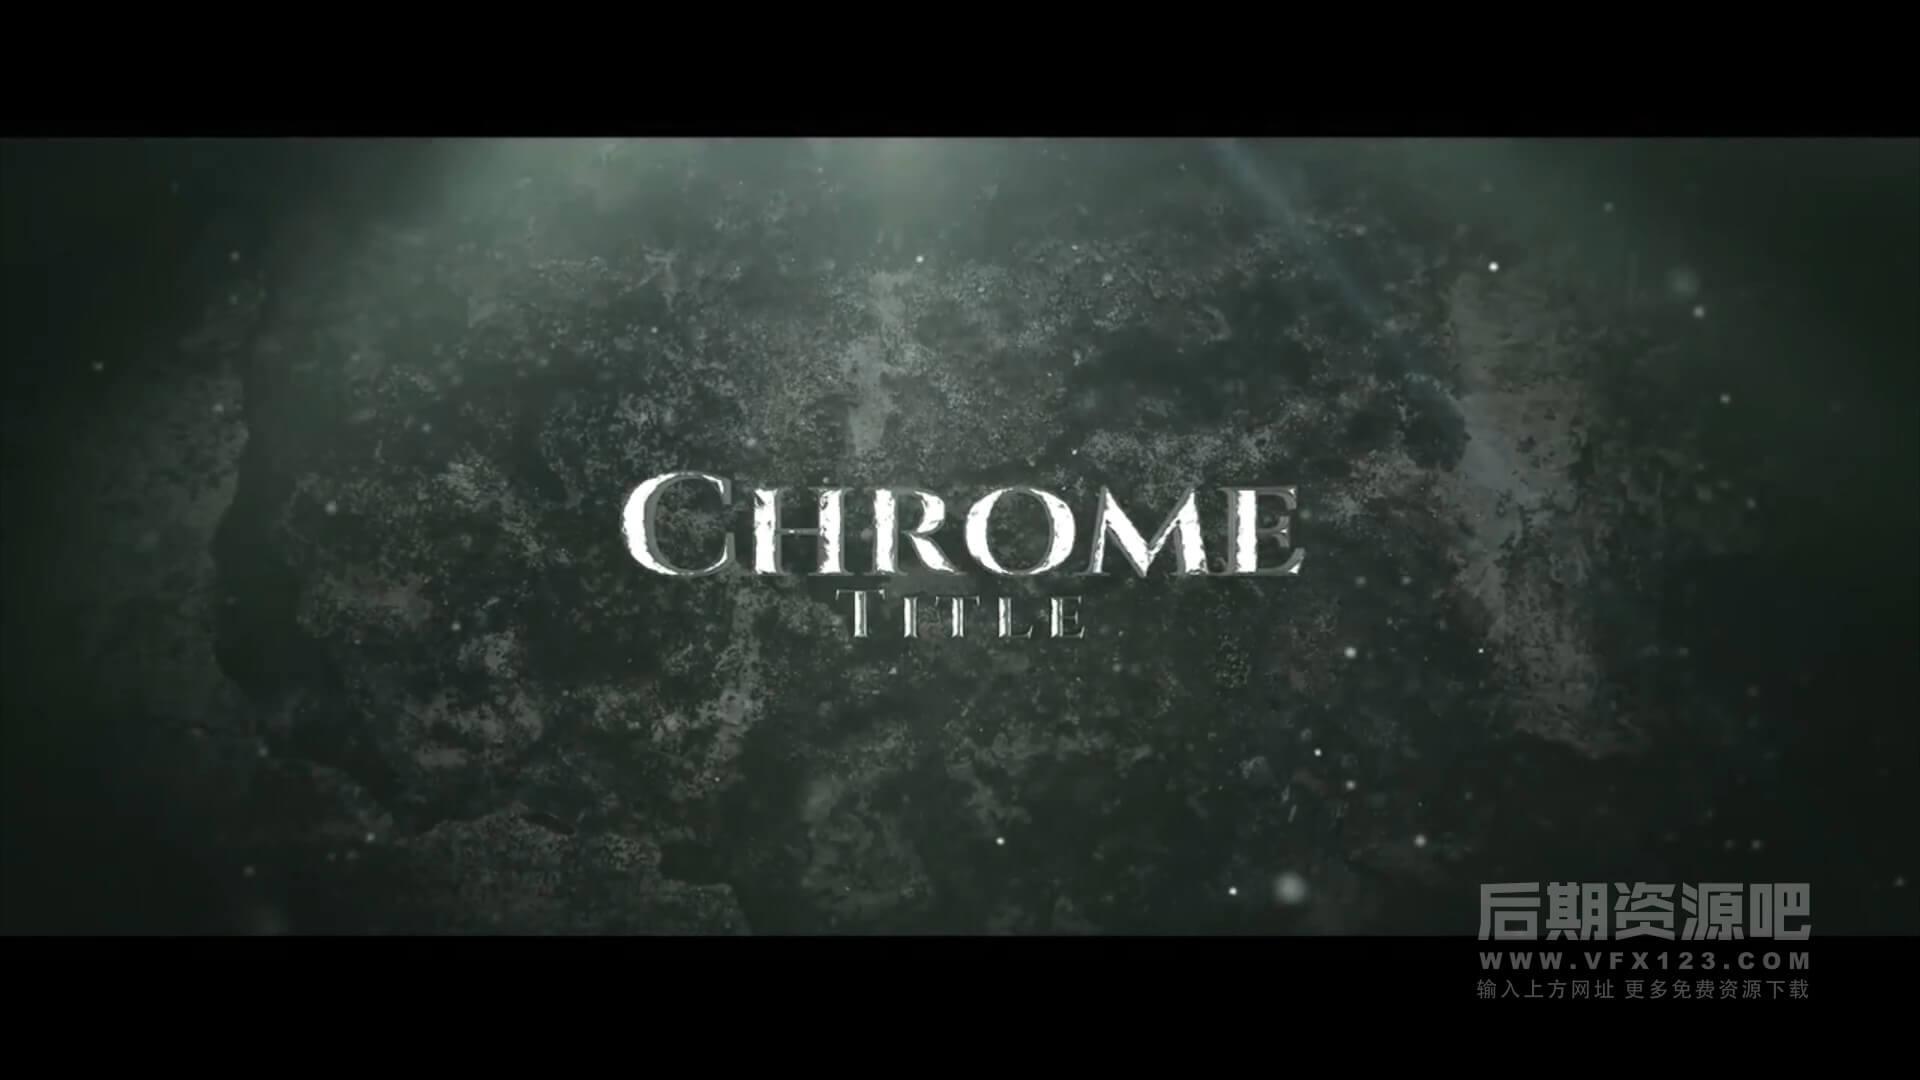 Fcpx插件 史诗级震撼大气电影预告片模板 Cinematic Title